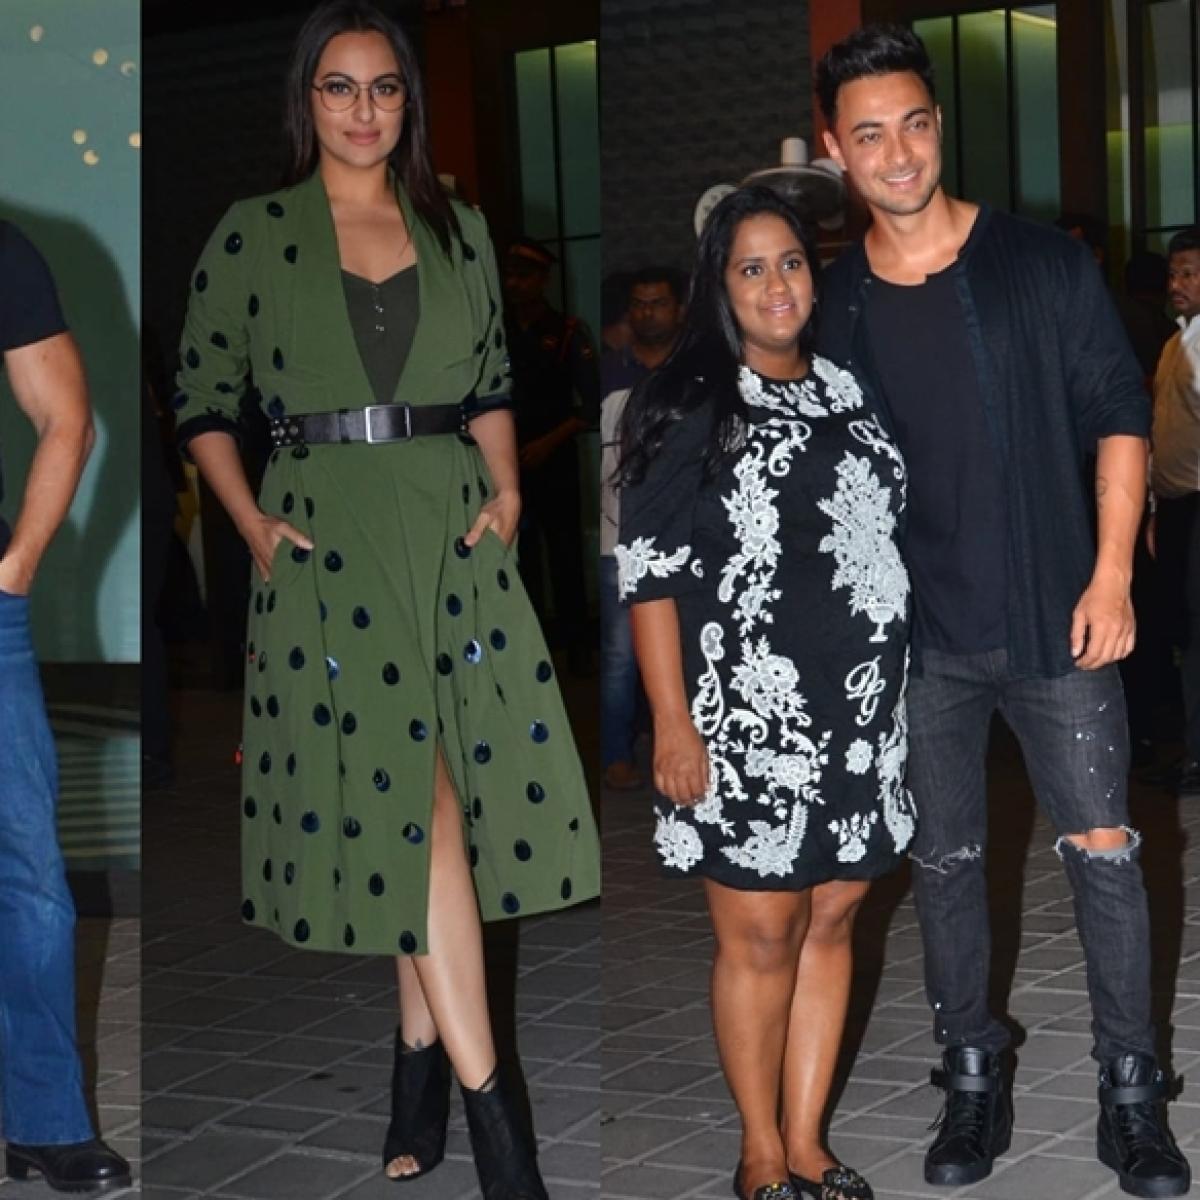 Salman, Sonakshi and other celebs attend Aayush-Arpita's wedding anniversary bash